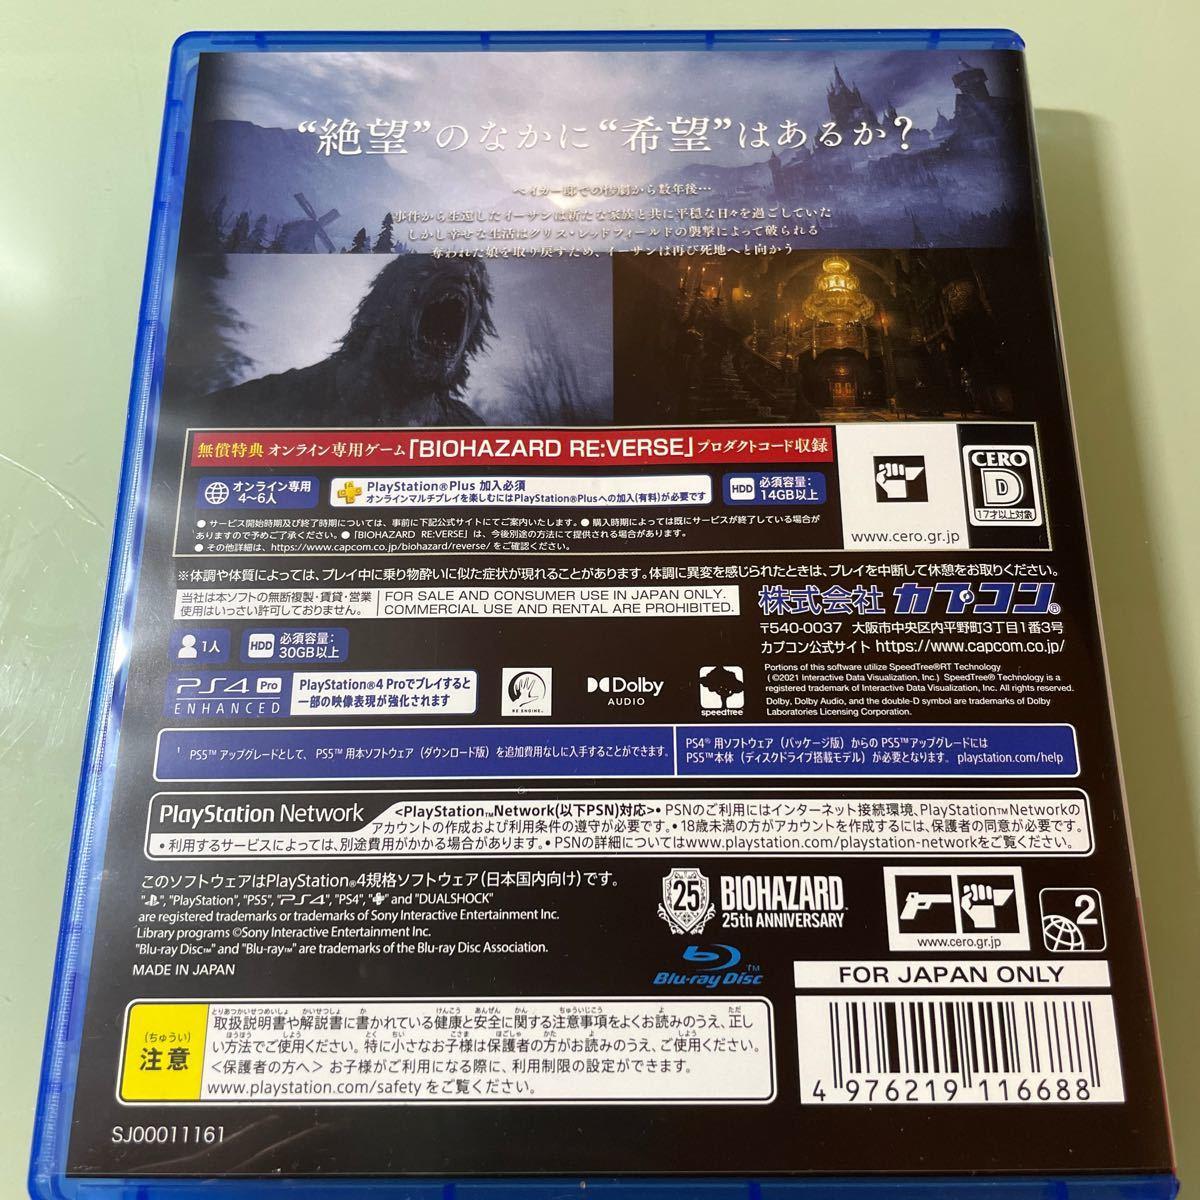 PS4 バイオハザードVILLAGE 特典未使用